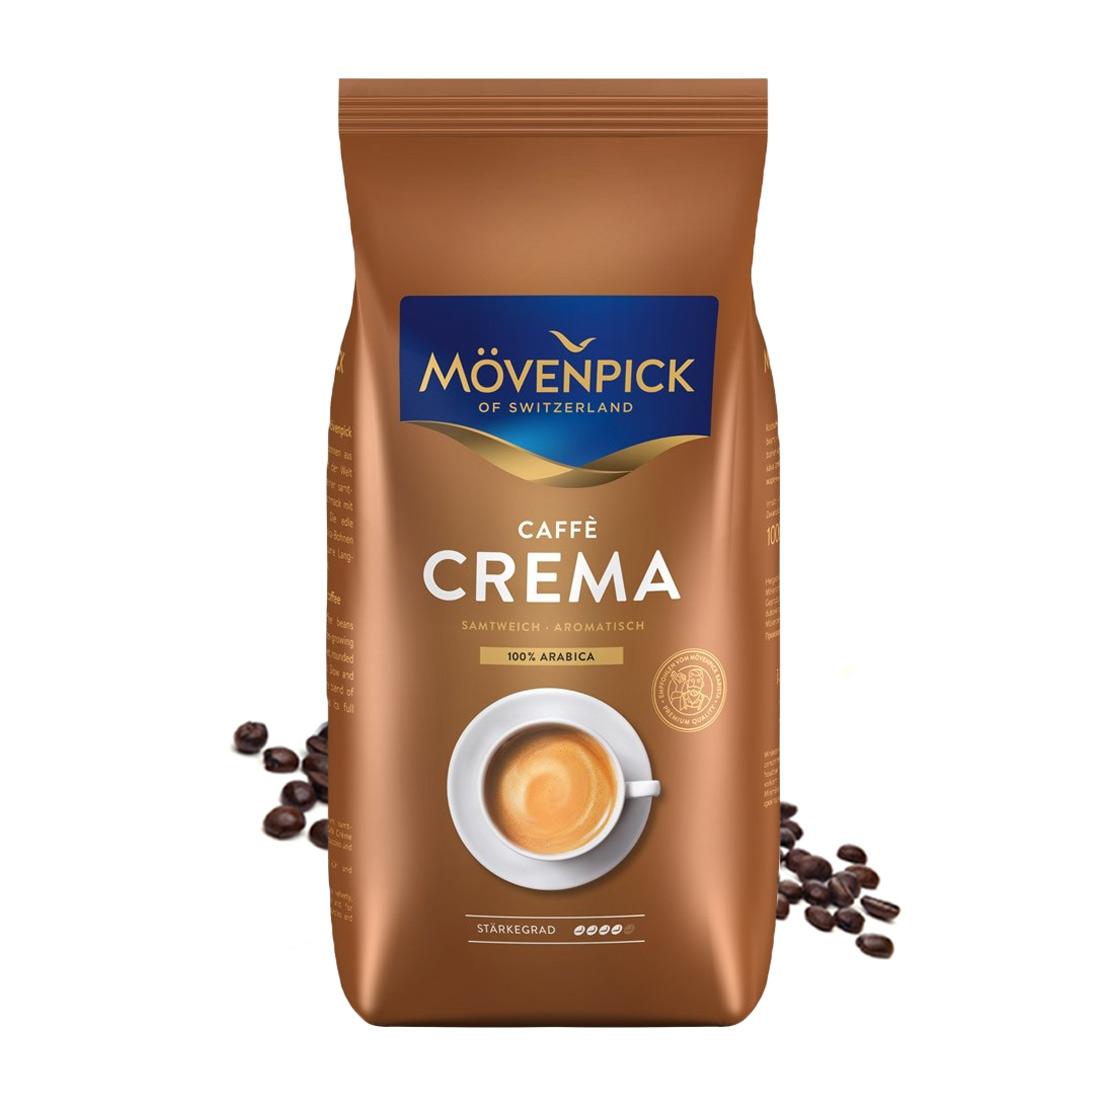 Movenpick Caffe Crema cafea boabe 1 kg